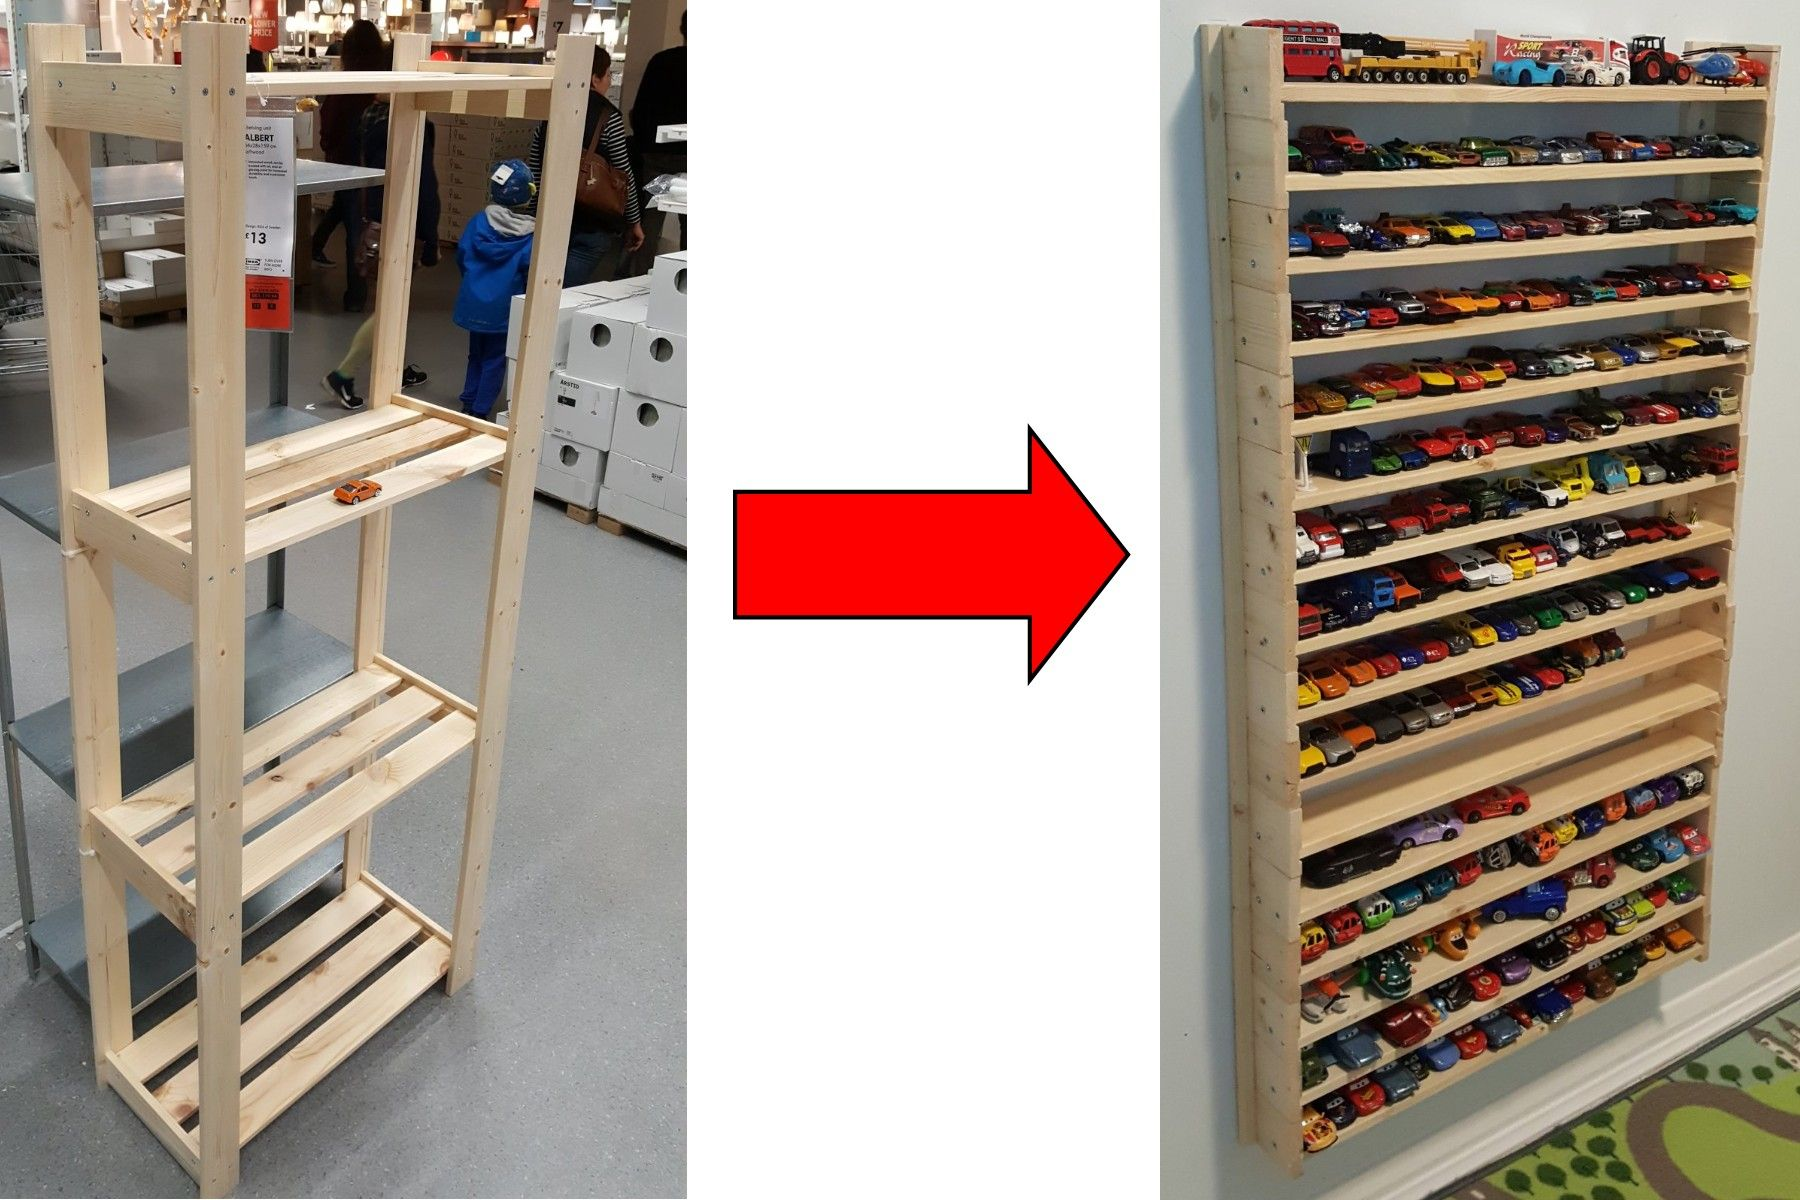 Hot Wheels Display Storage Unit, Ikea Shelve Hack, 13